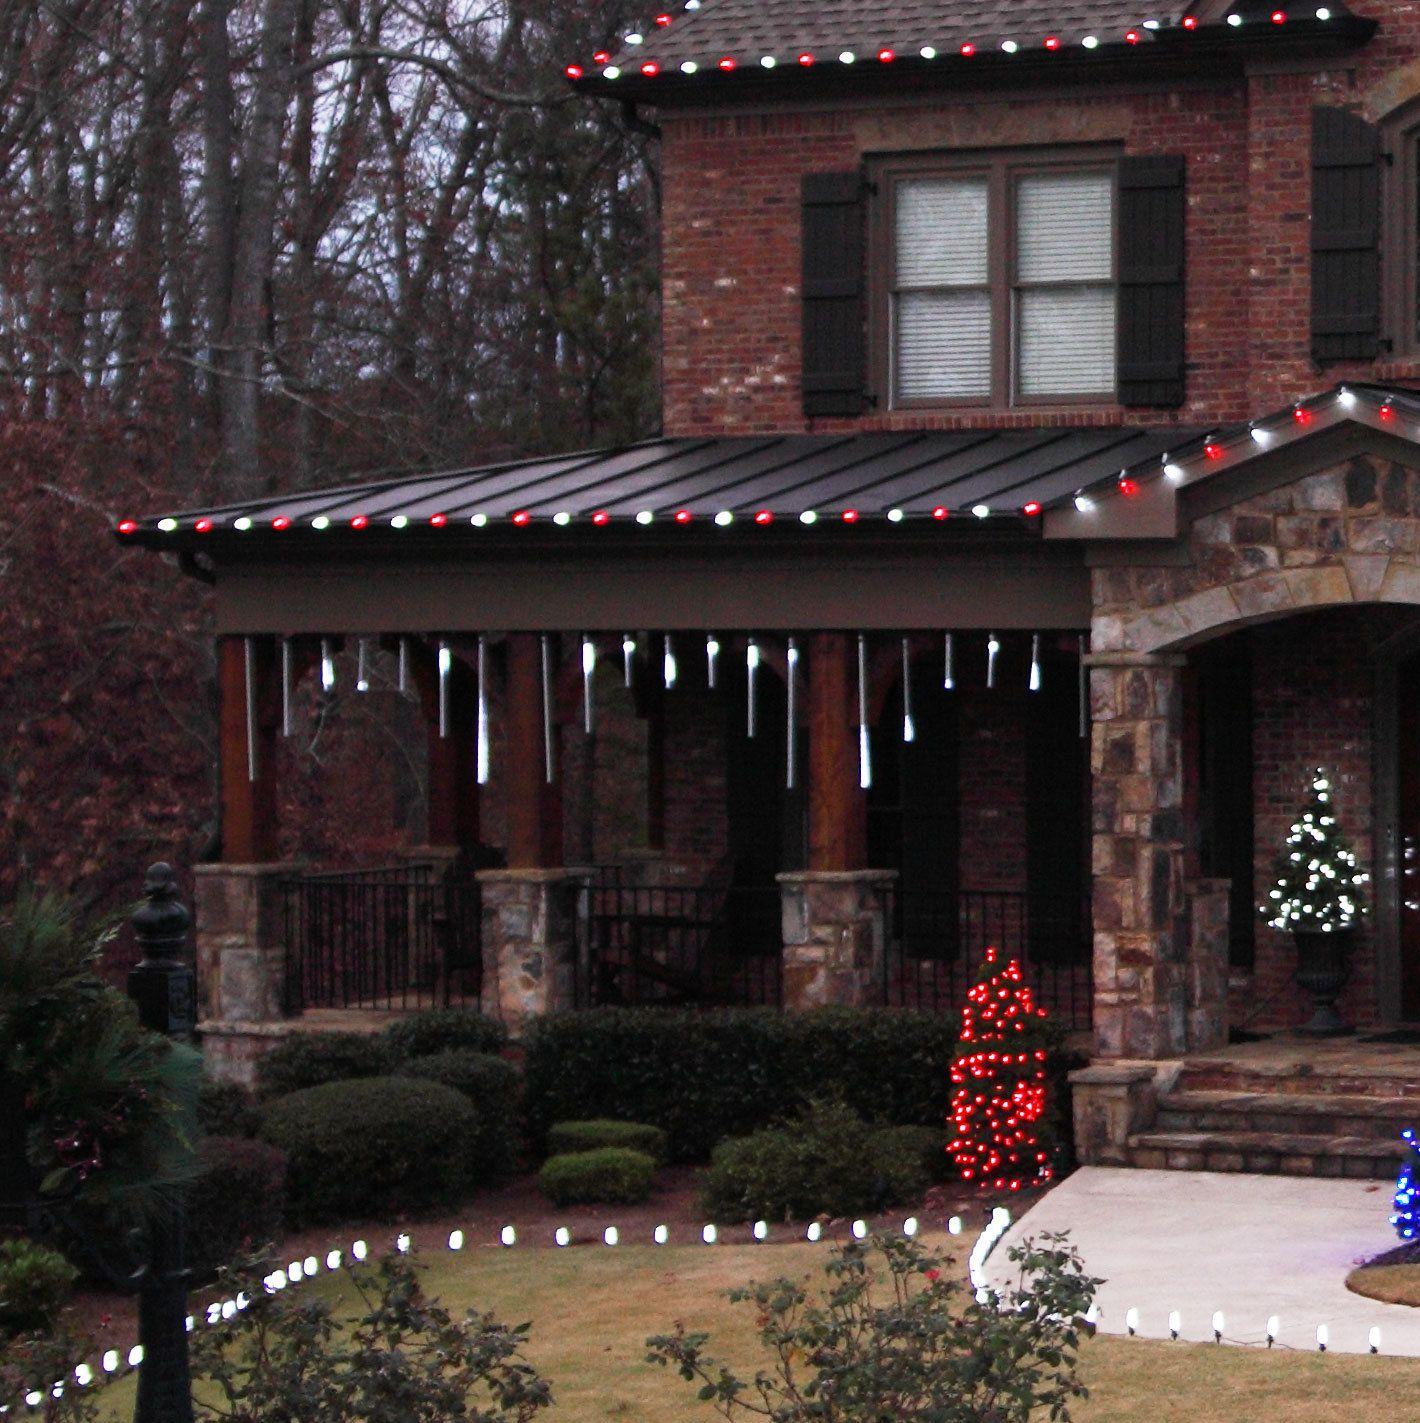 Residential Outdoor Christmas Light Display | ... snowfall lights ...